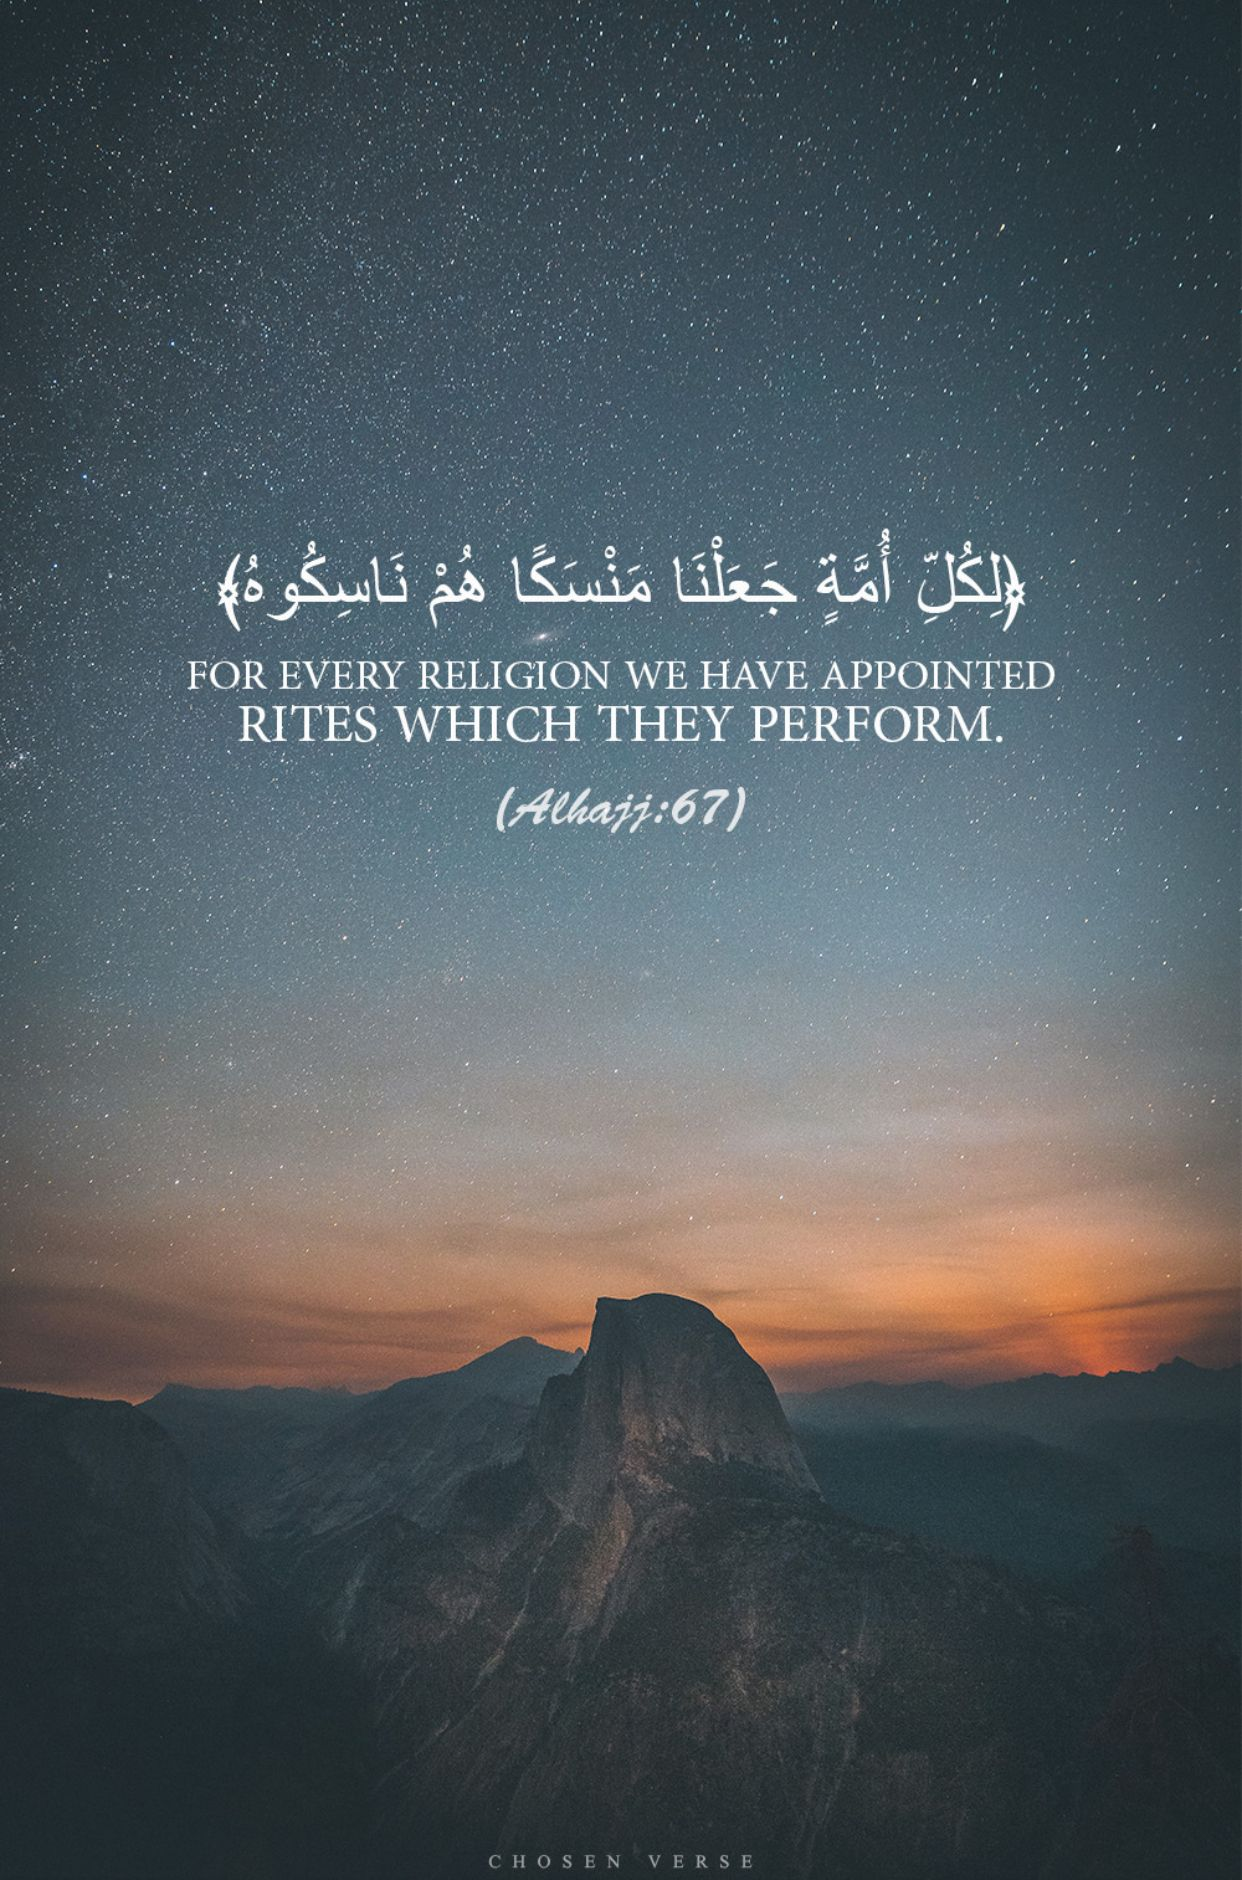 Pin by Fahad Baloch on Quran Verses & Islamic Quotes  Islamic